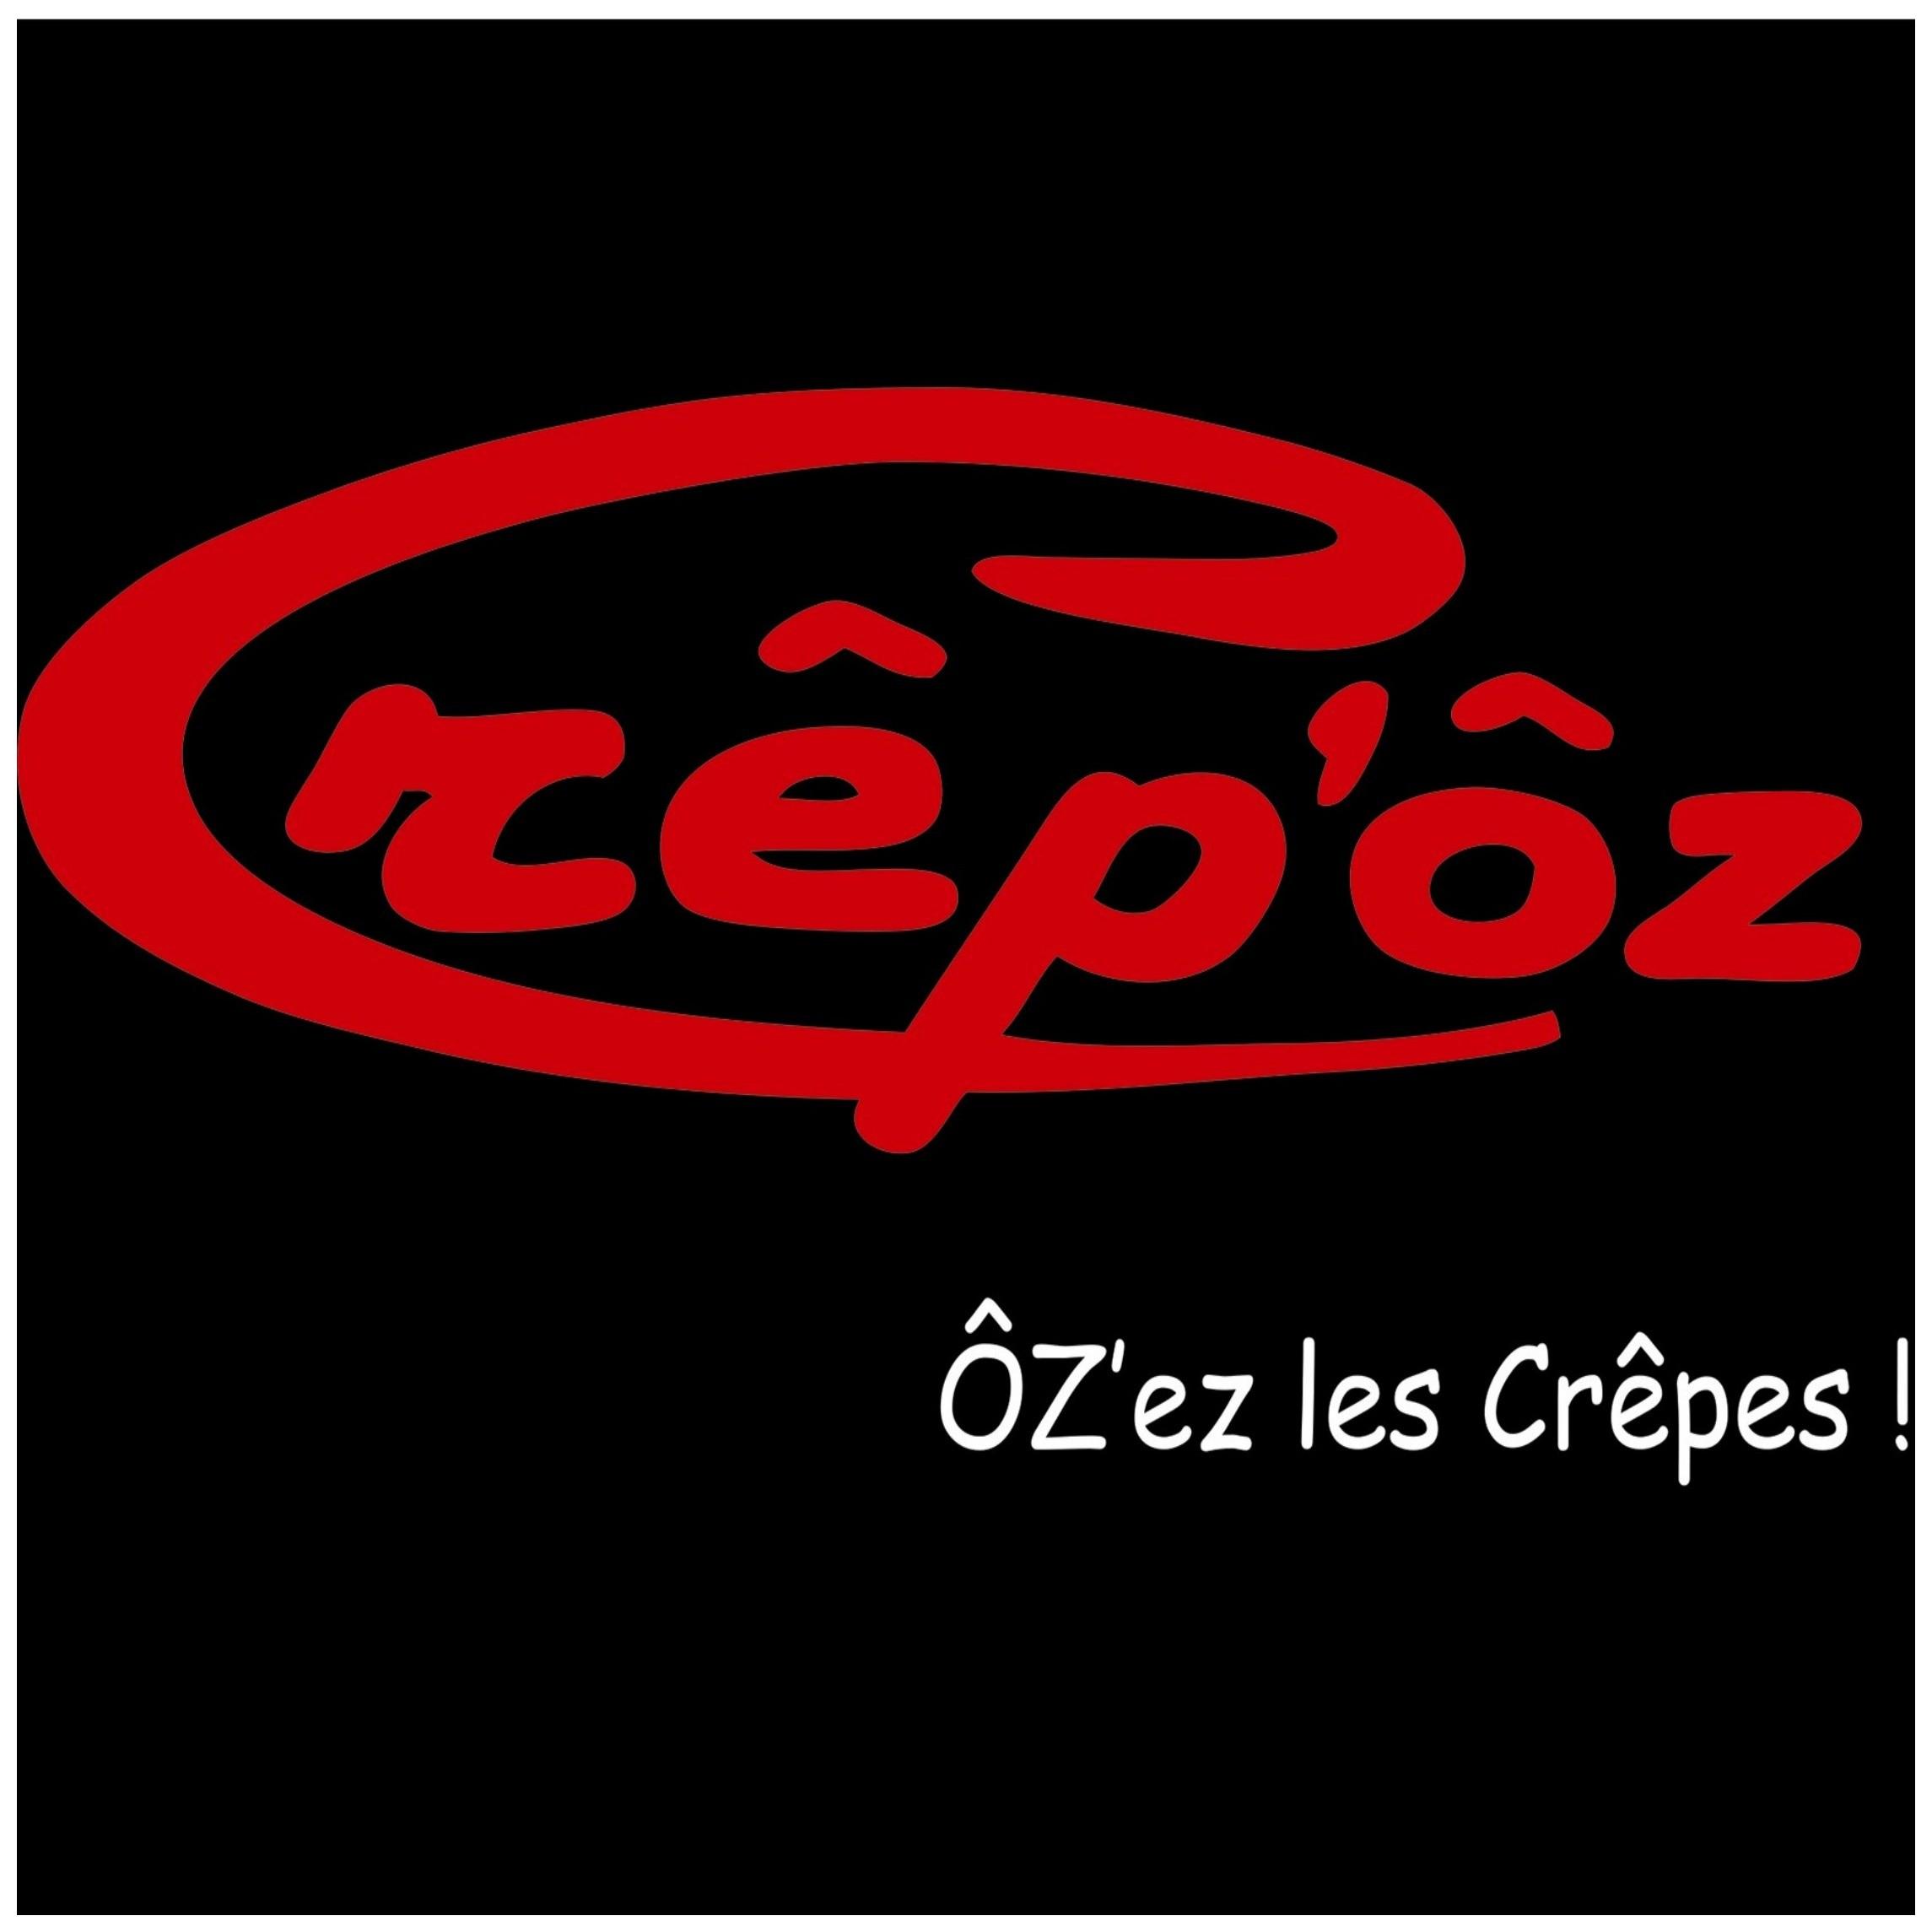 Crep Oz